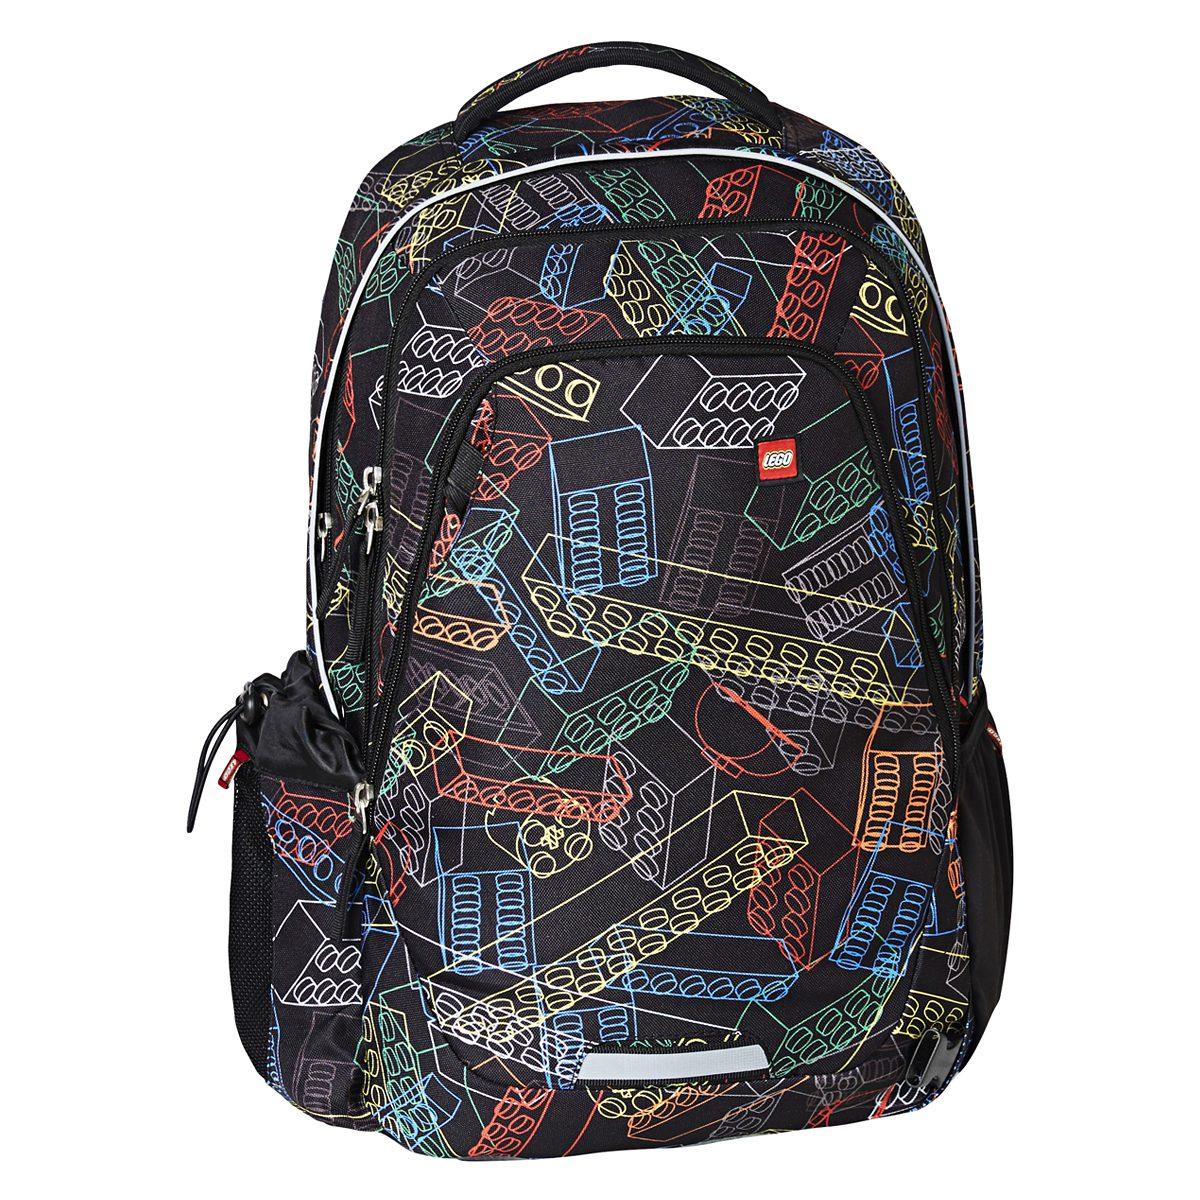 Rucsac, Zero, Bricks, Core Line, Negru, Lego, LG-20042-1716